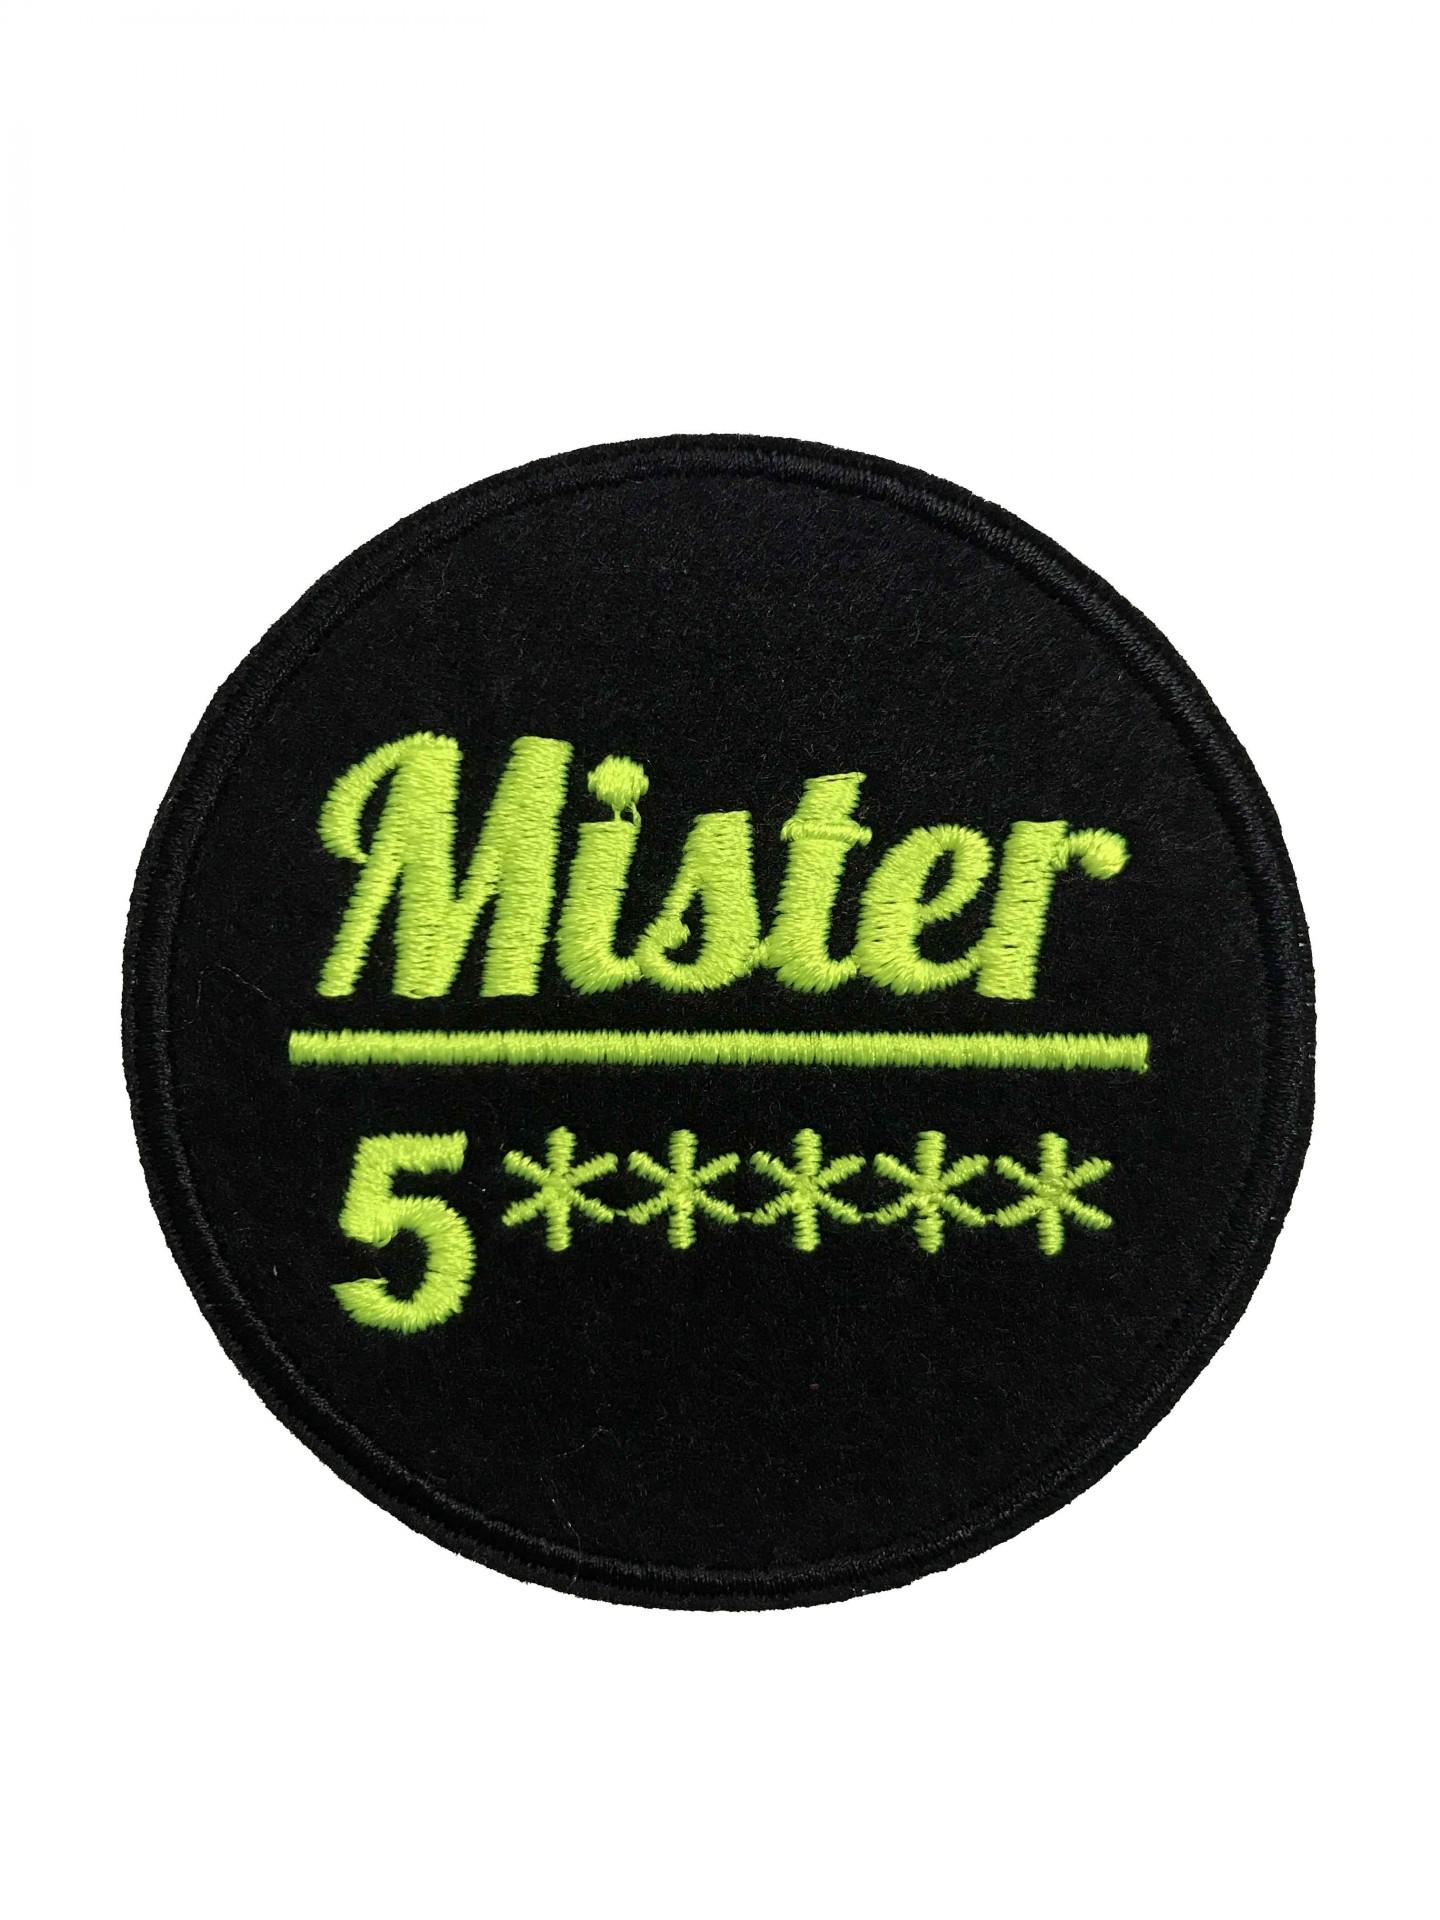 Emblema Mister 5*